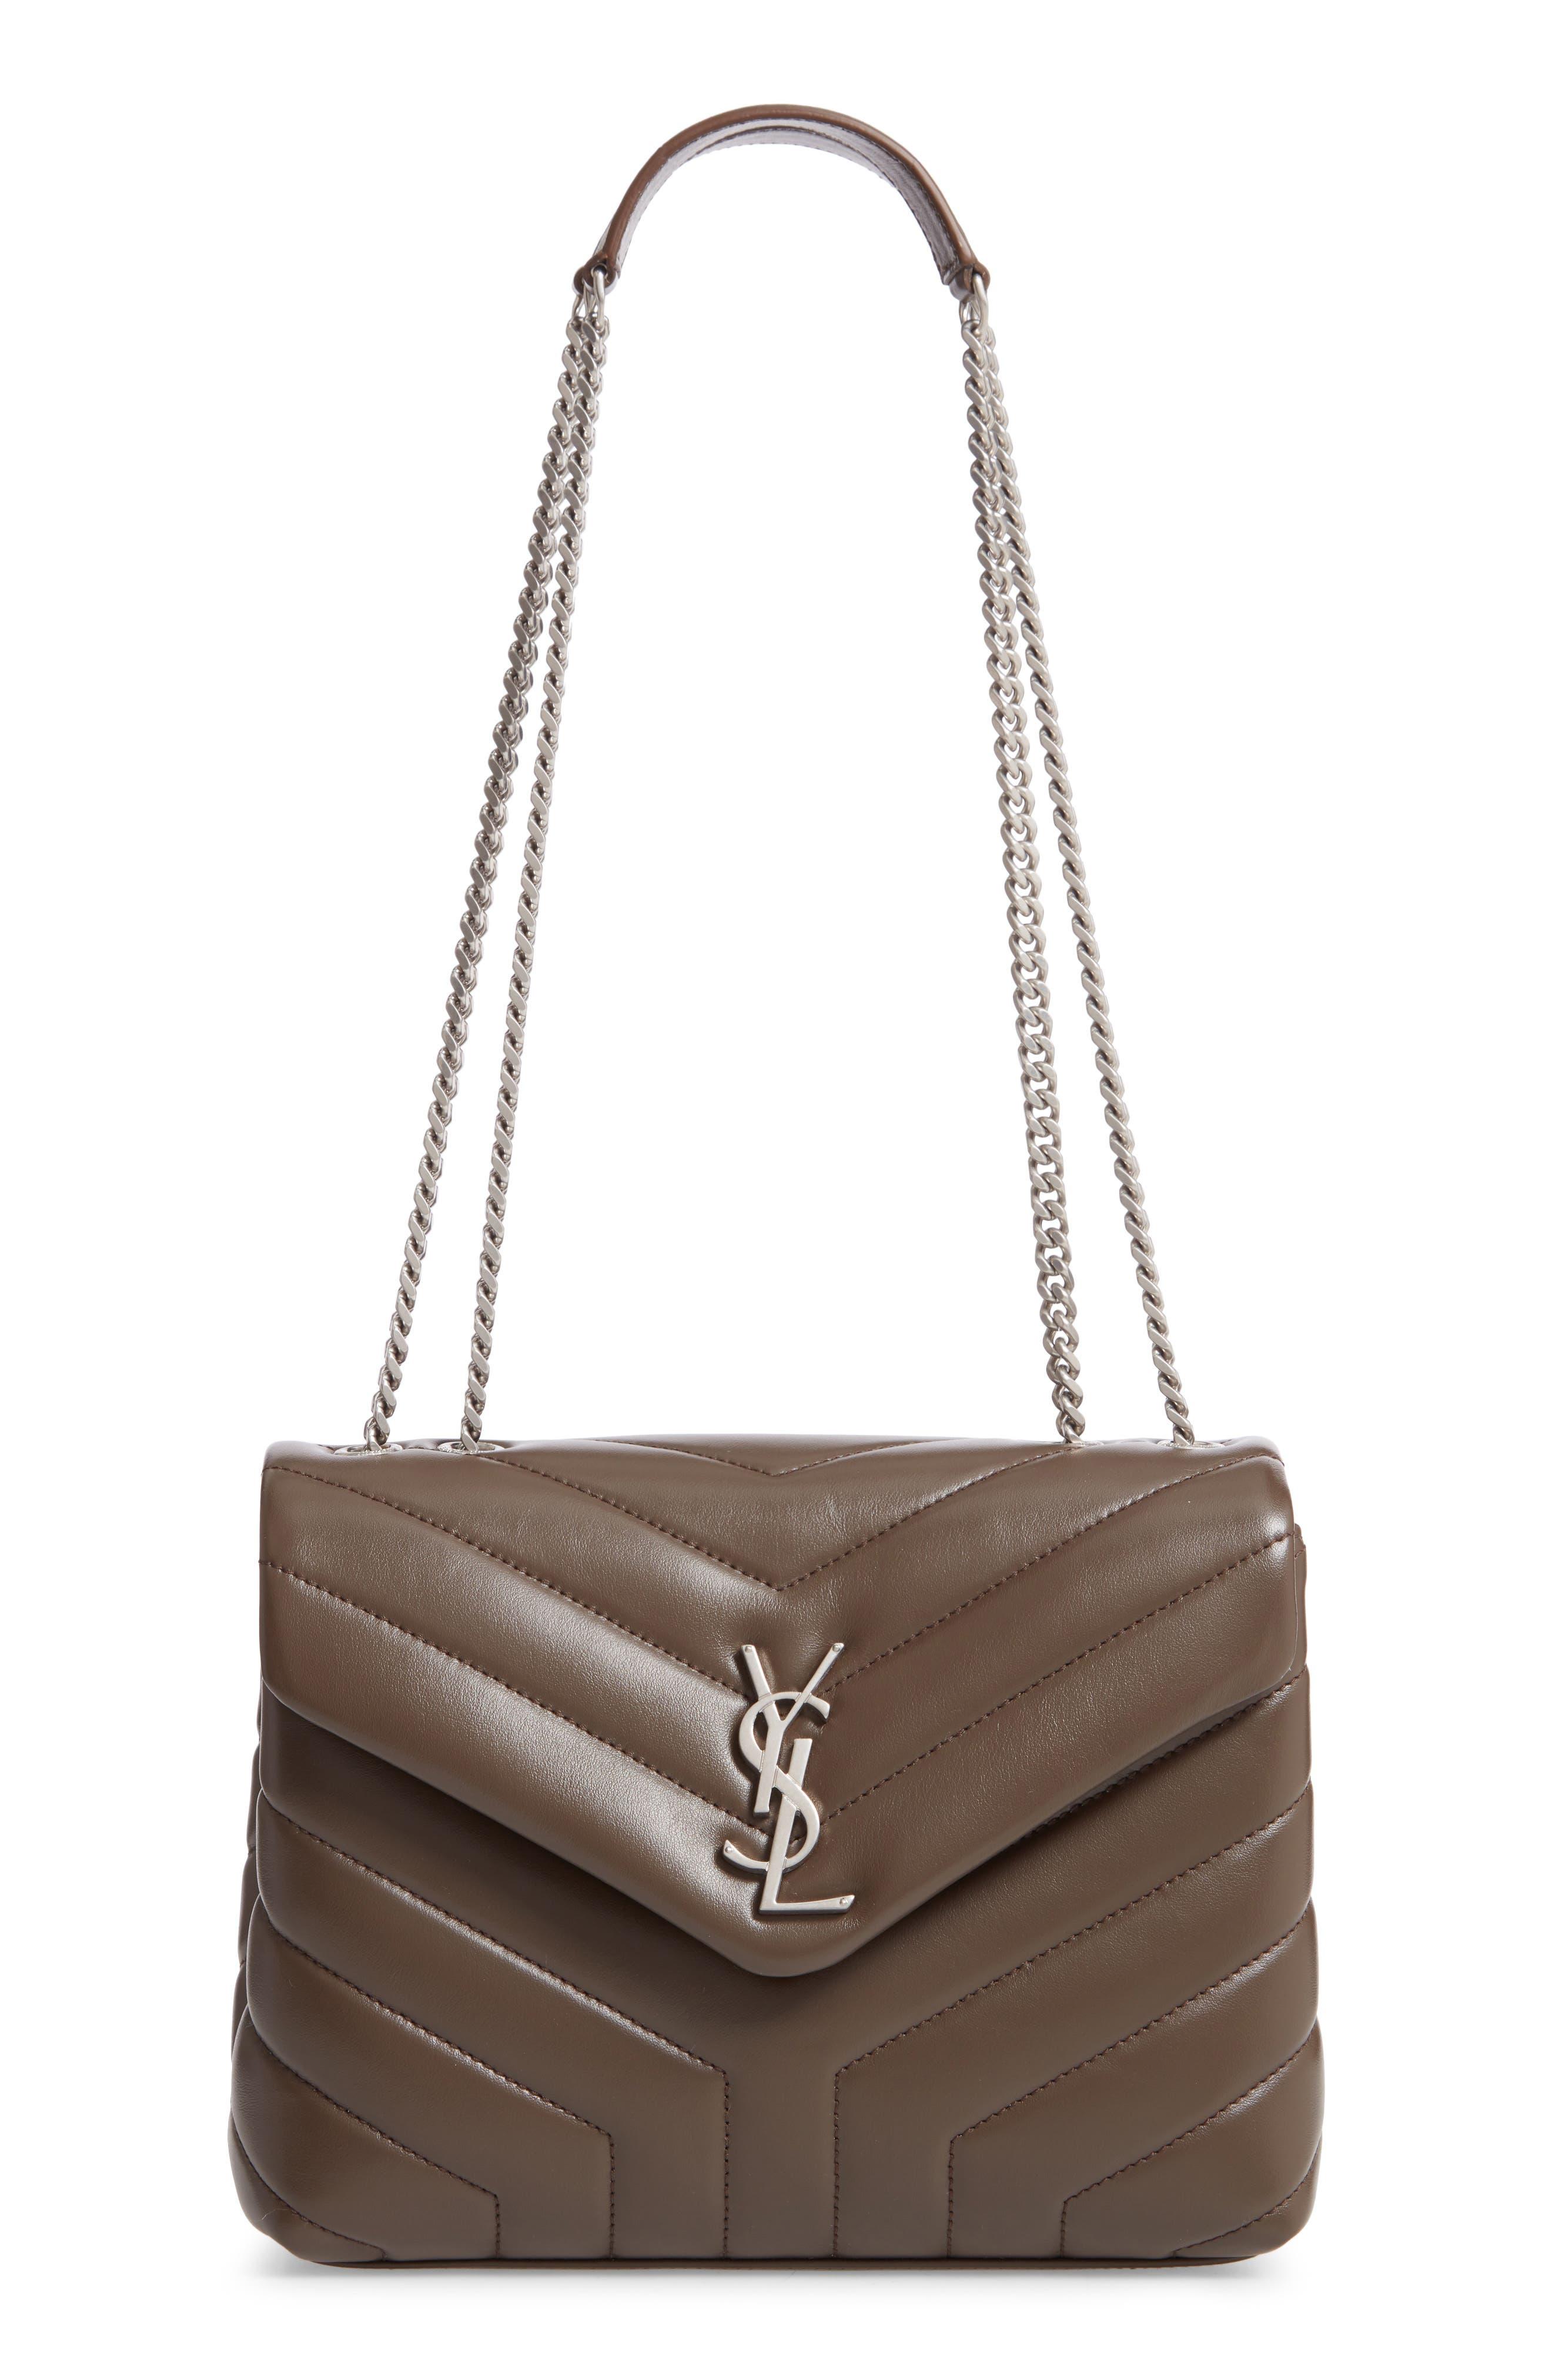 Small Loulou Matelassé Leather Shoulder Bag, Main, color, FAGGIO/ FAGGIO